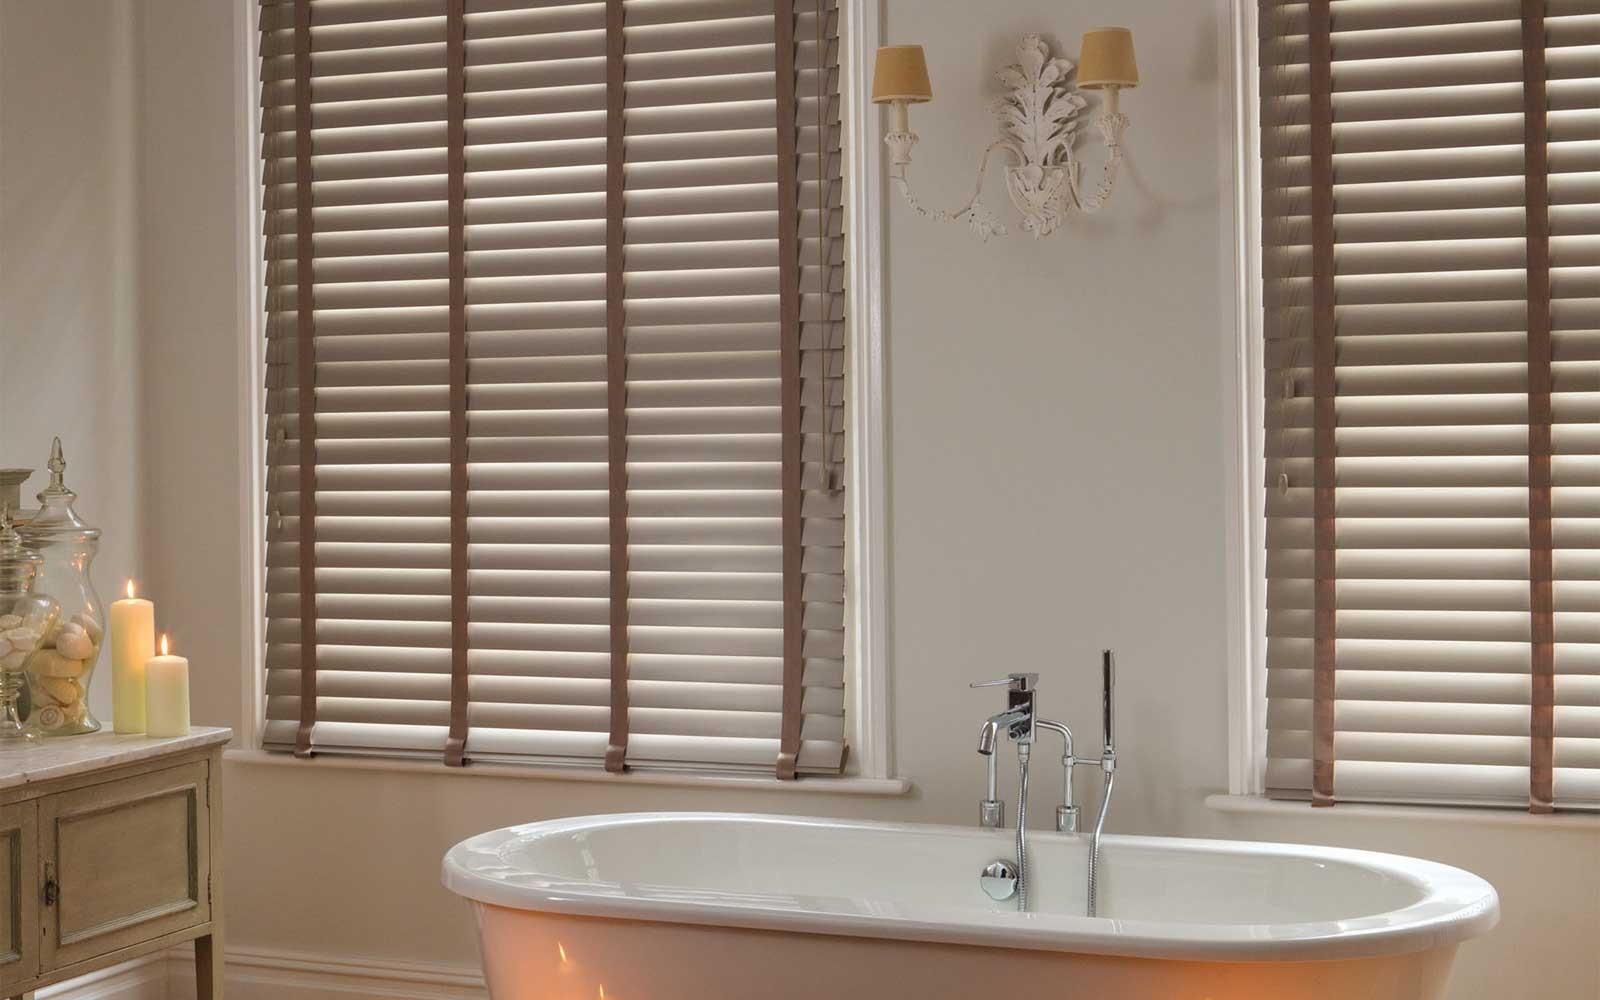 Window blinds bathroom - Window Blinds Bathroom 52